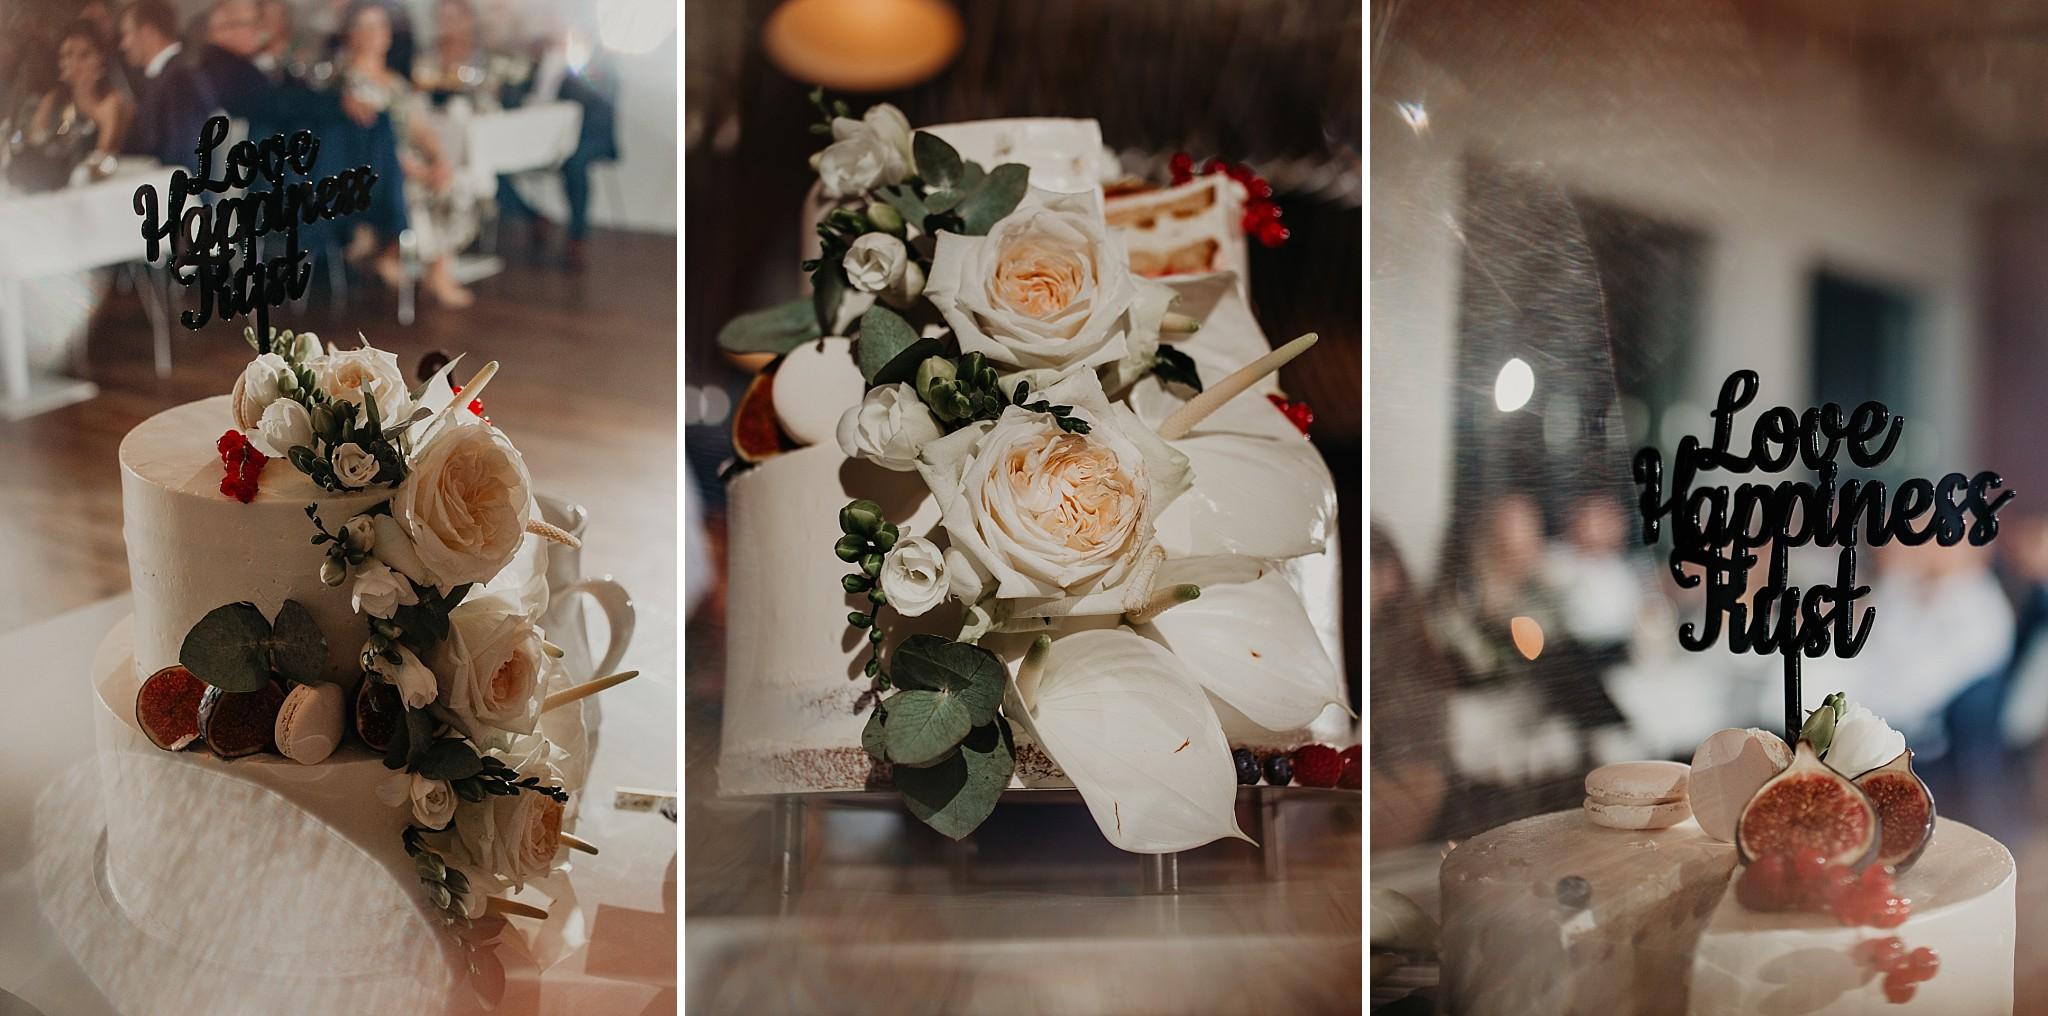 fotograf poznan wesele dobra truskawka piekne wesele pod poznaniem wesele w dobrej truskawce piekna para mloda slub marzen slub koronawirus slub listopad wesele koronawirus 499